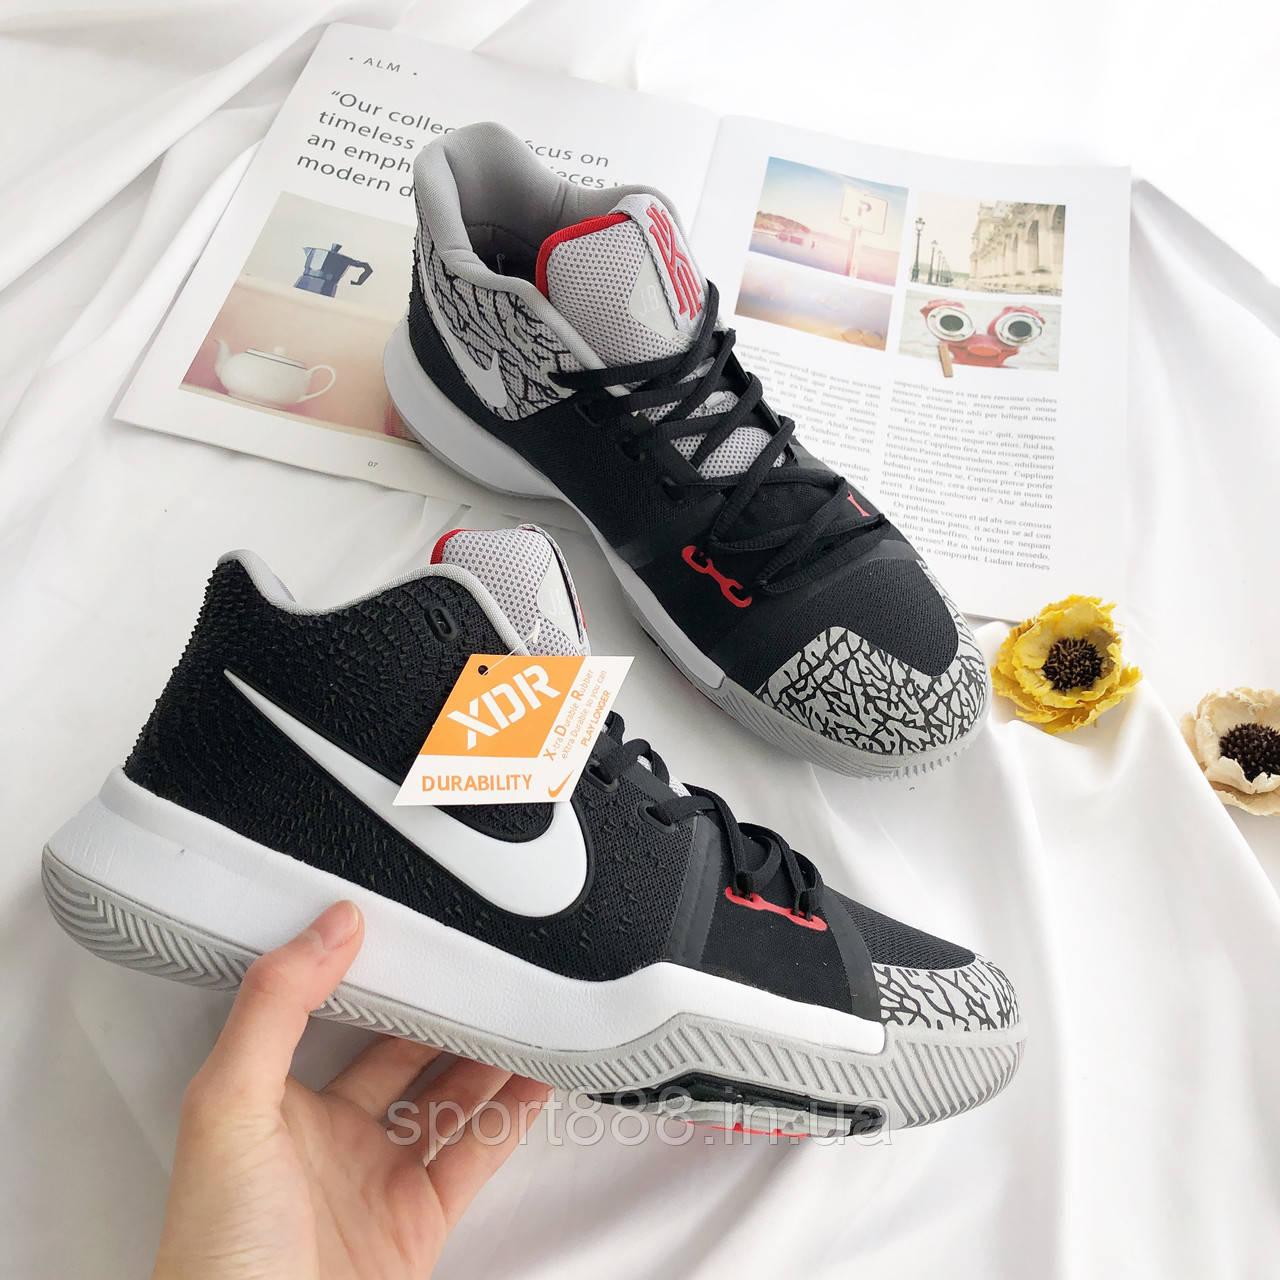 new concept e4a99 f6e20 Nike Kyrie 3